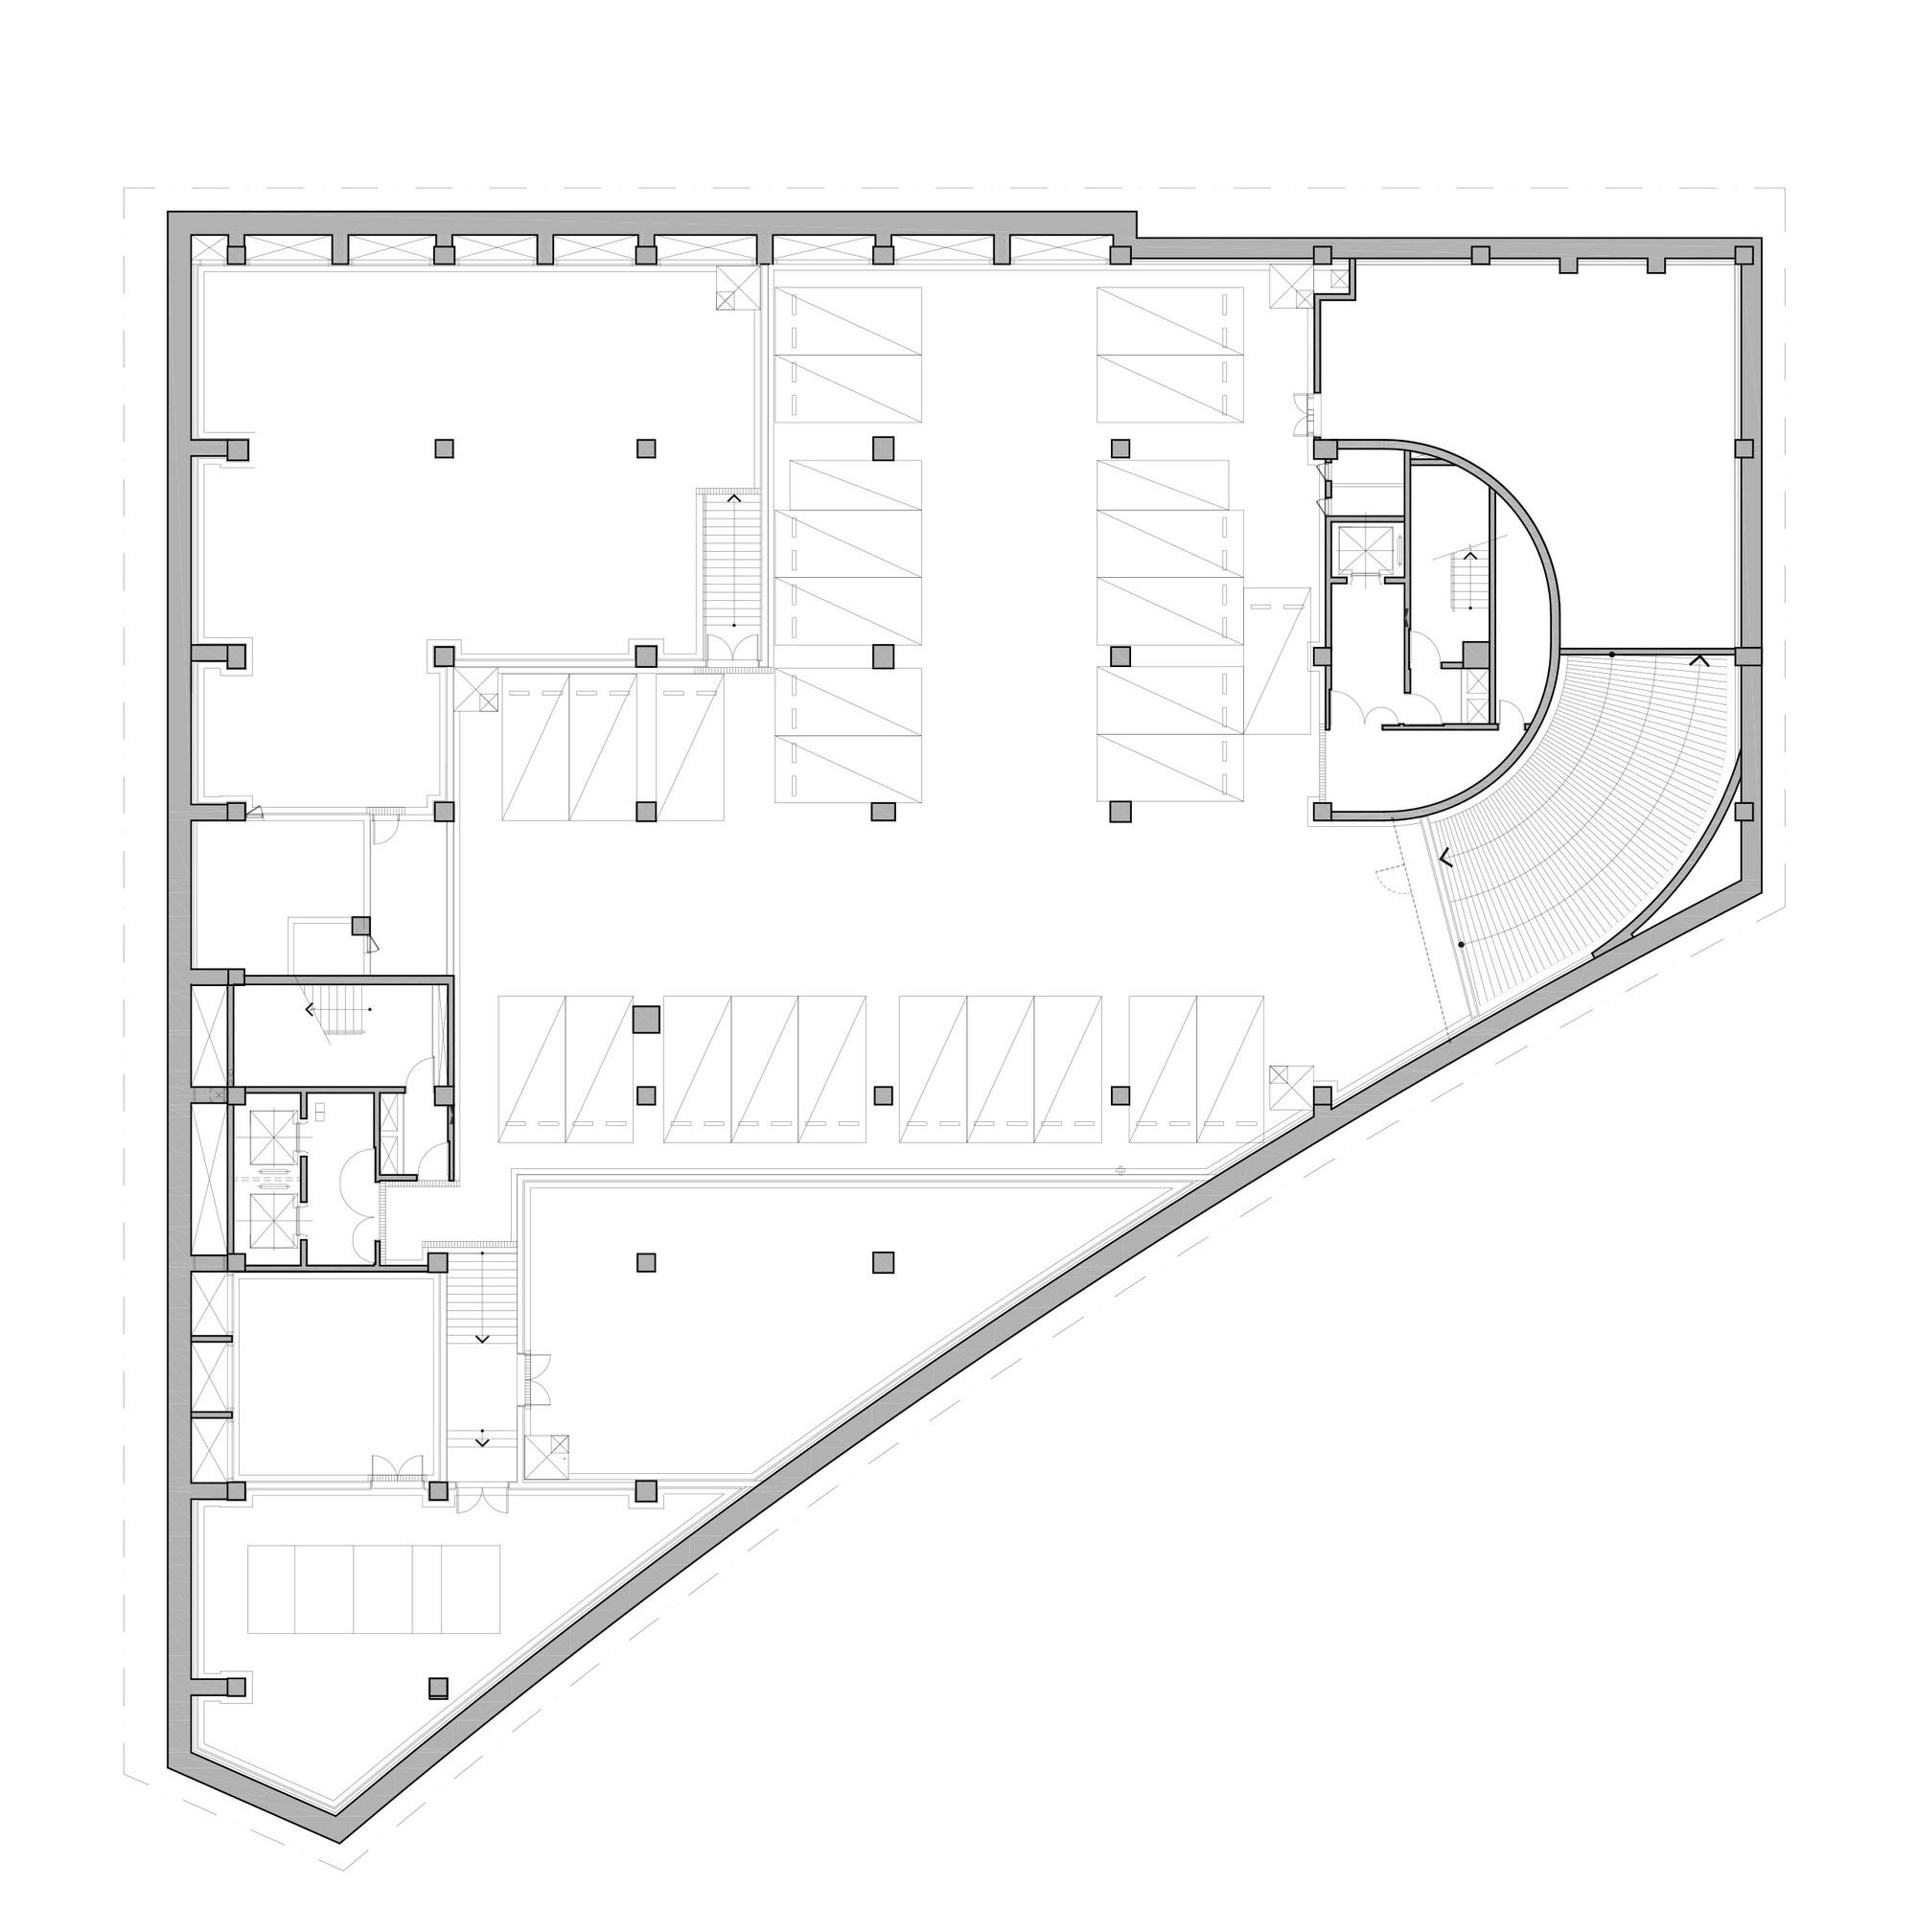 gallery of the sarang community church seoinn design group 38 b4 floor plan